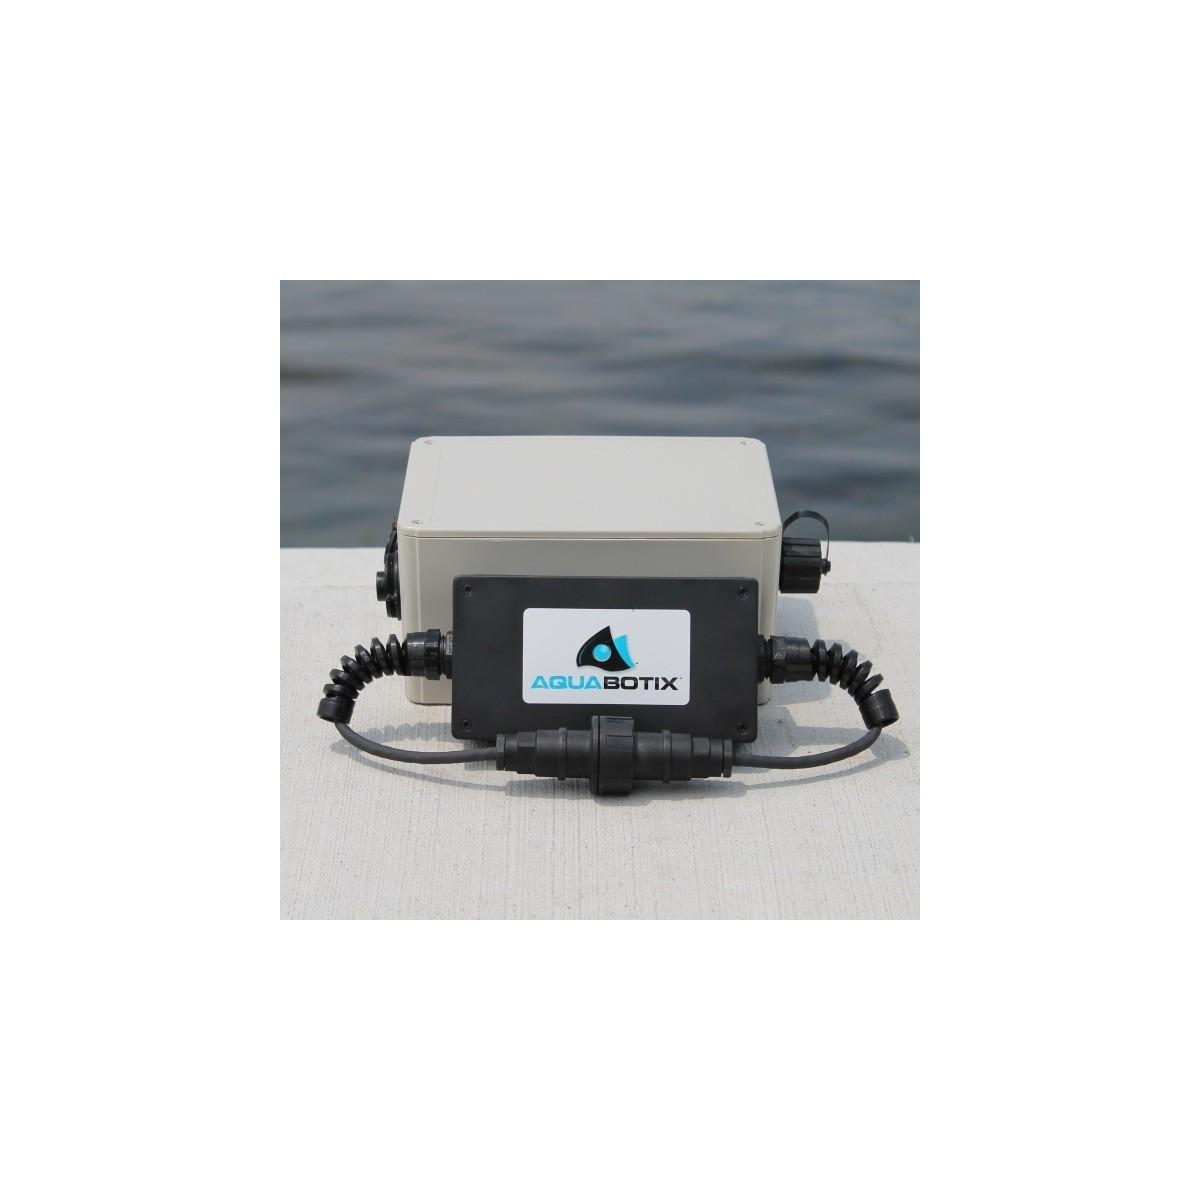 Aquabotix Extended Range Topside Box for Endura ROV